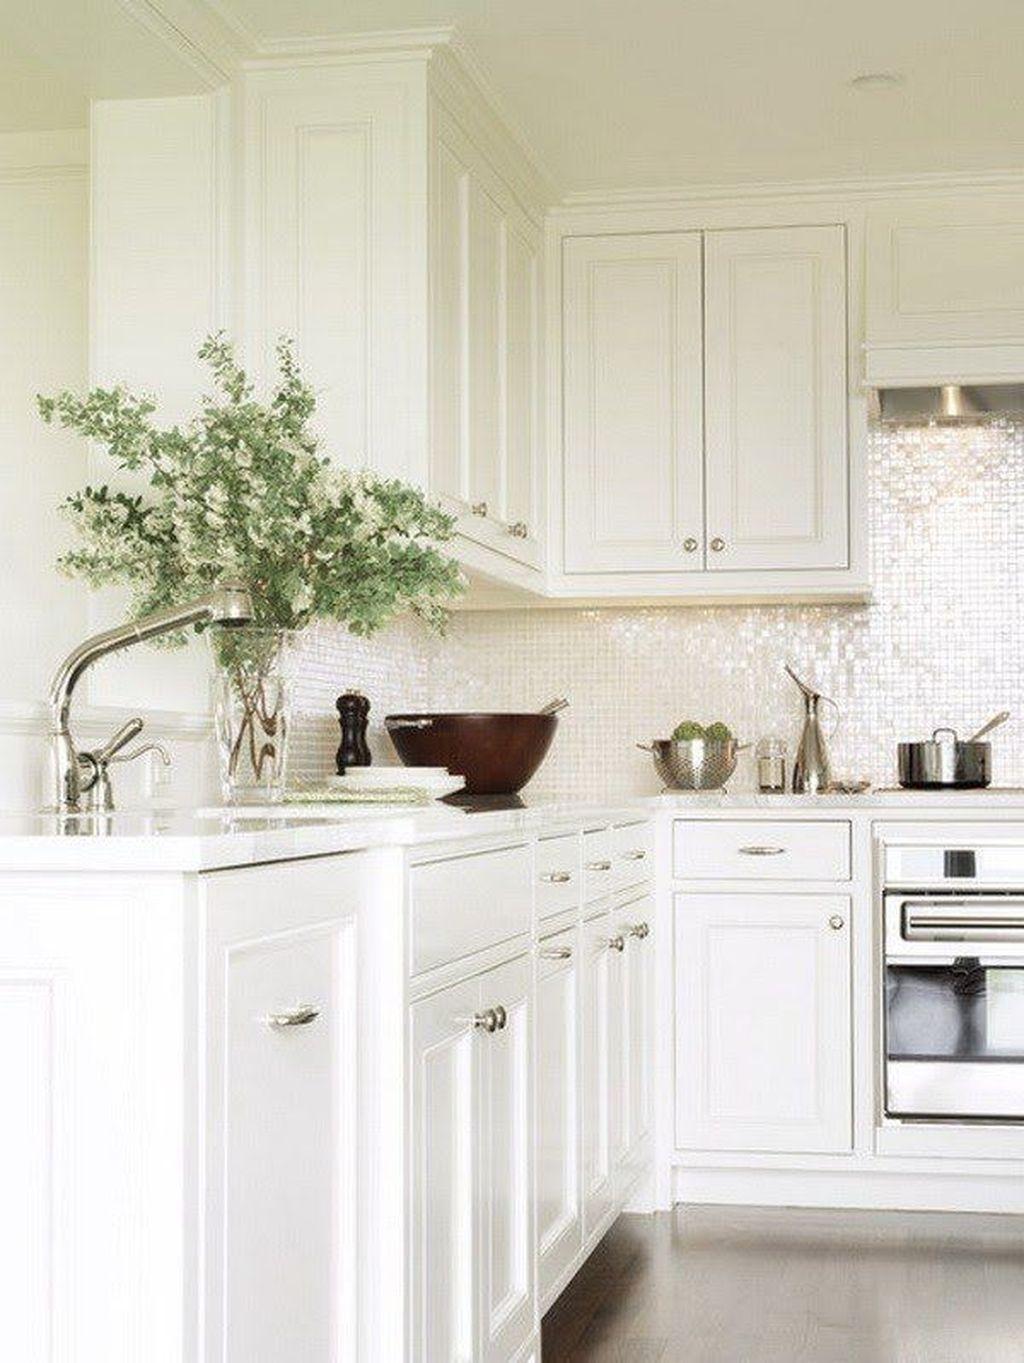 Stunning Glass Backsplash Kitchen Ideas 13